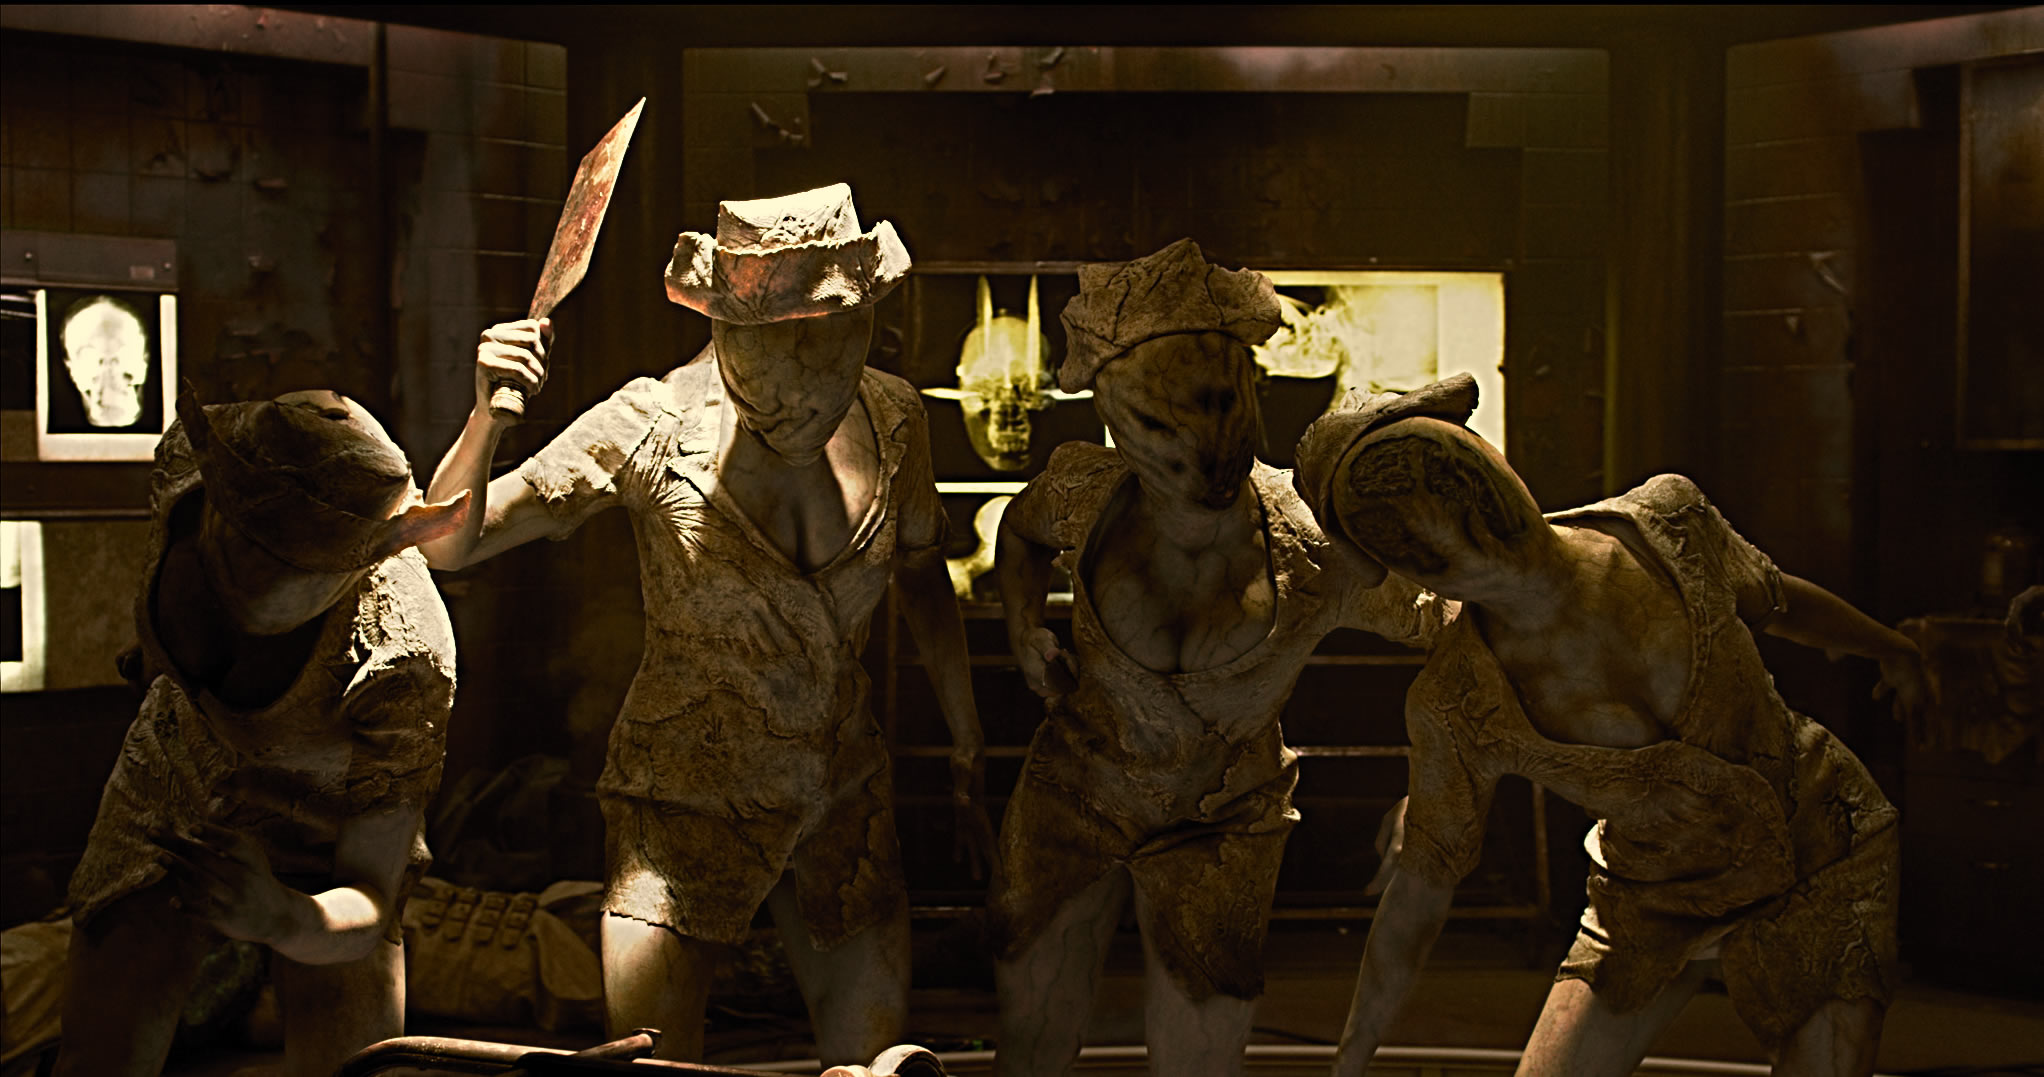 Silent Hill Revelation 2012 Dawning Creates